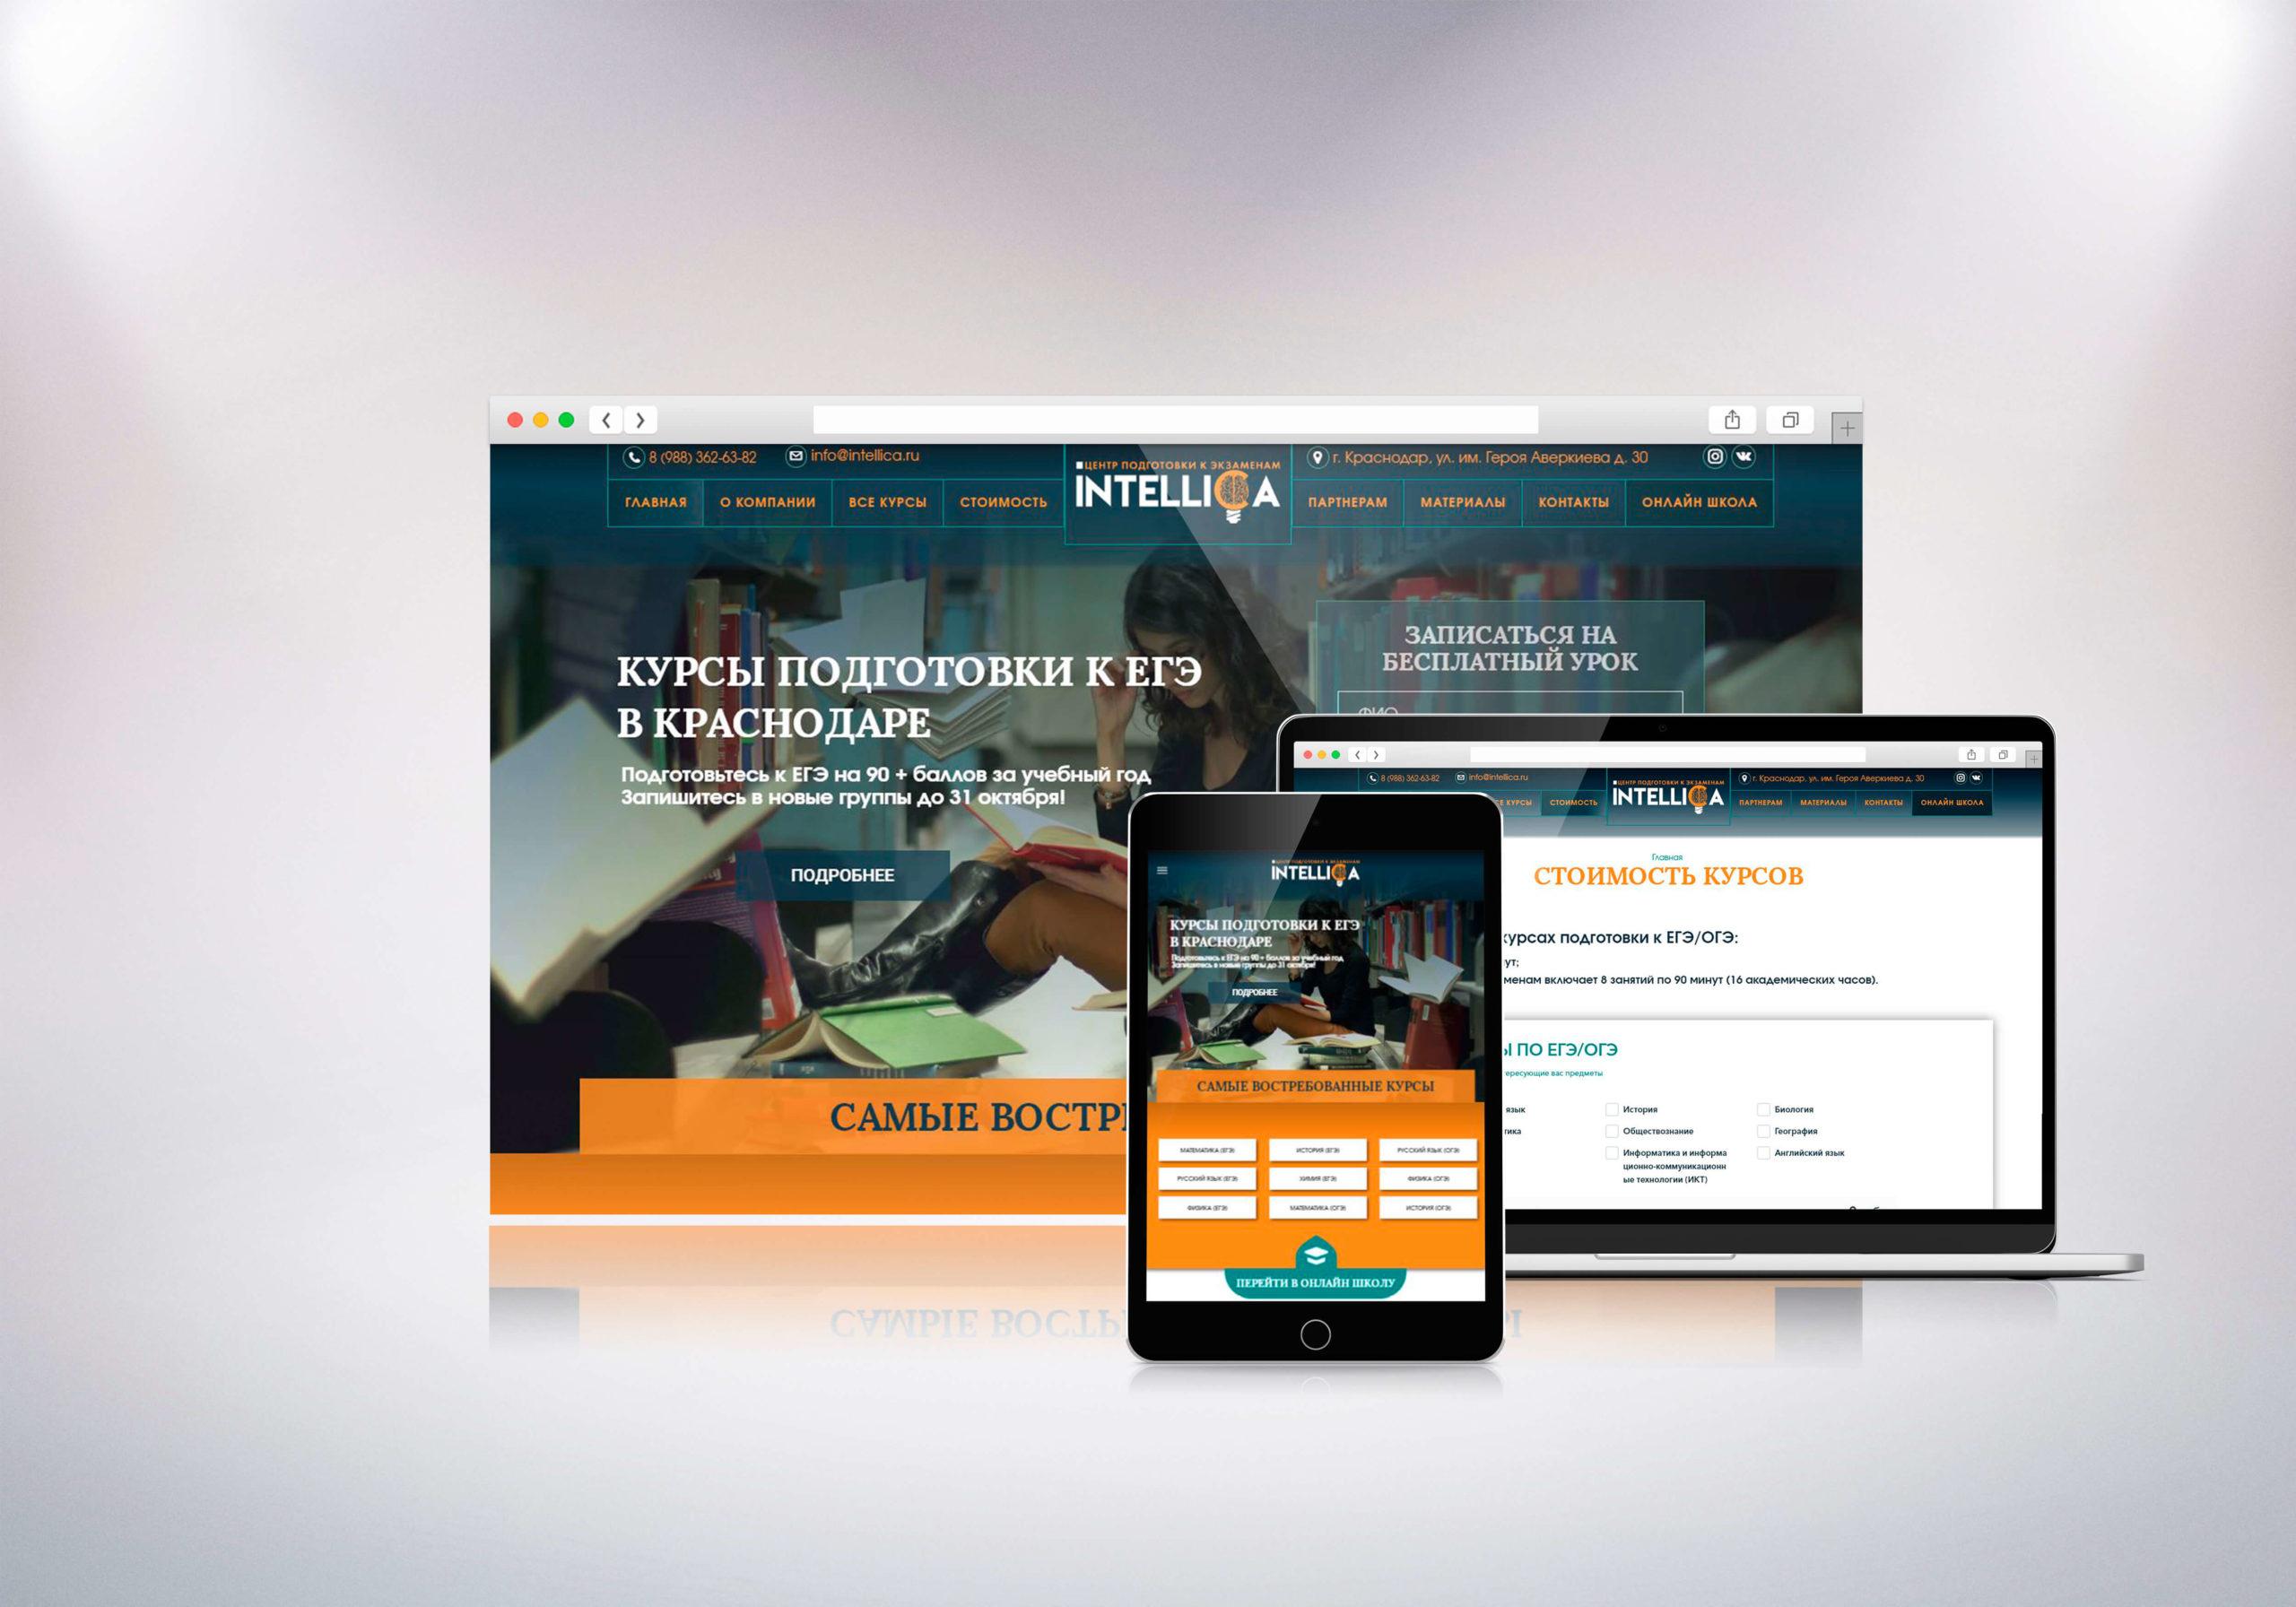 intellica site (1)